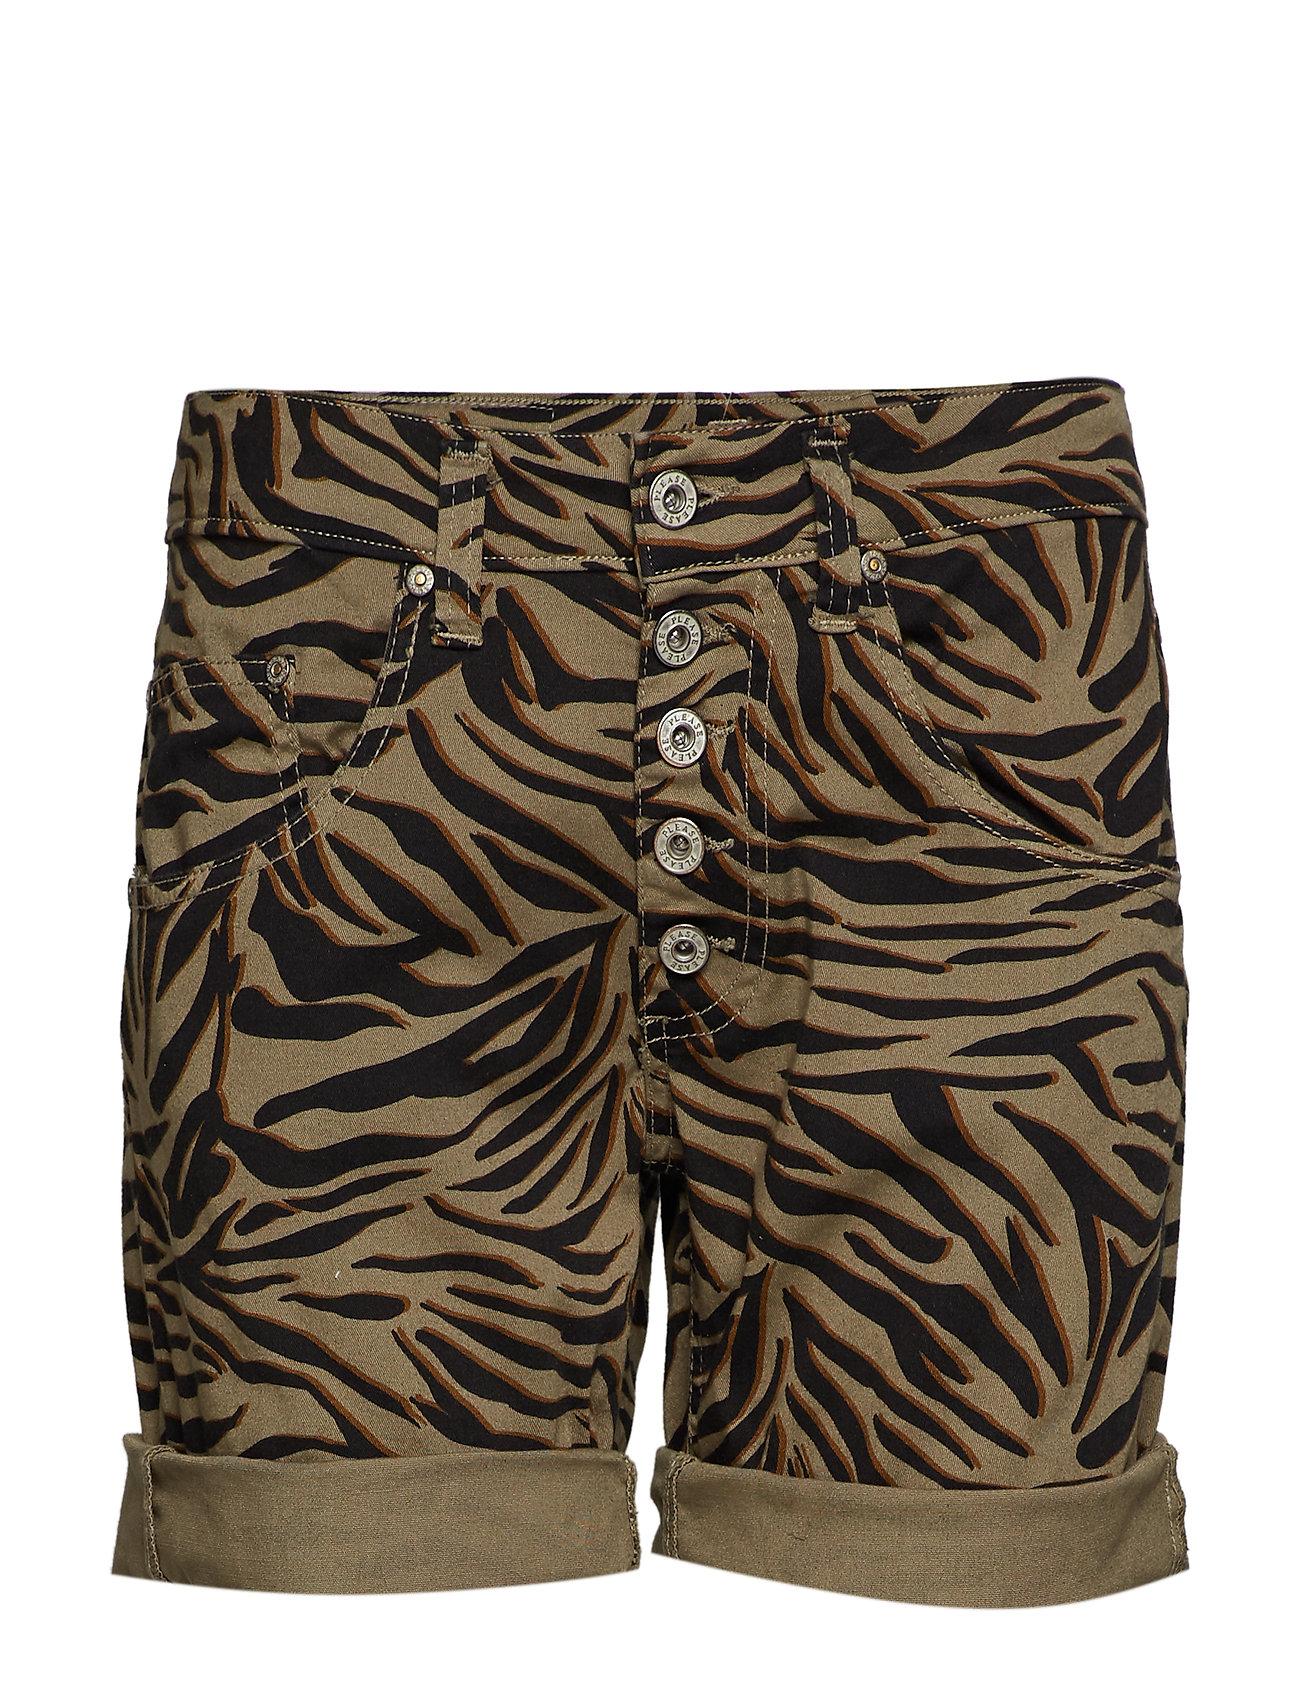 Please Jeans 5B SHORTS ZEBRA - 6022 COOL KAKI